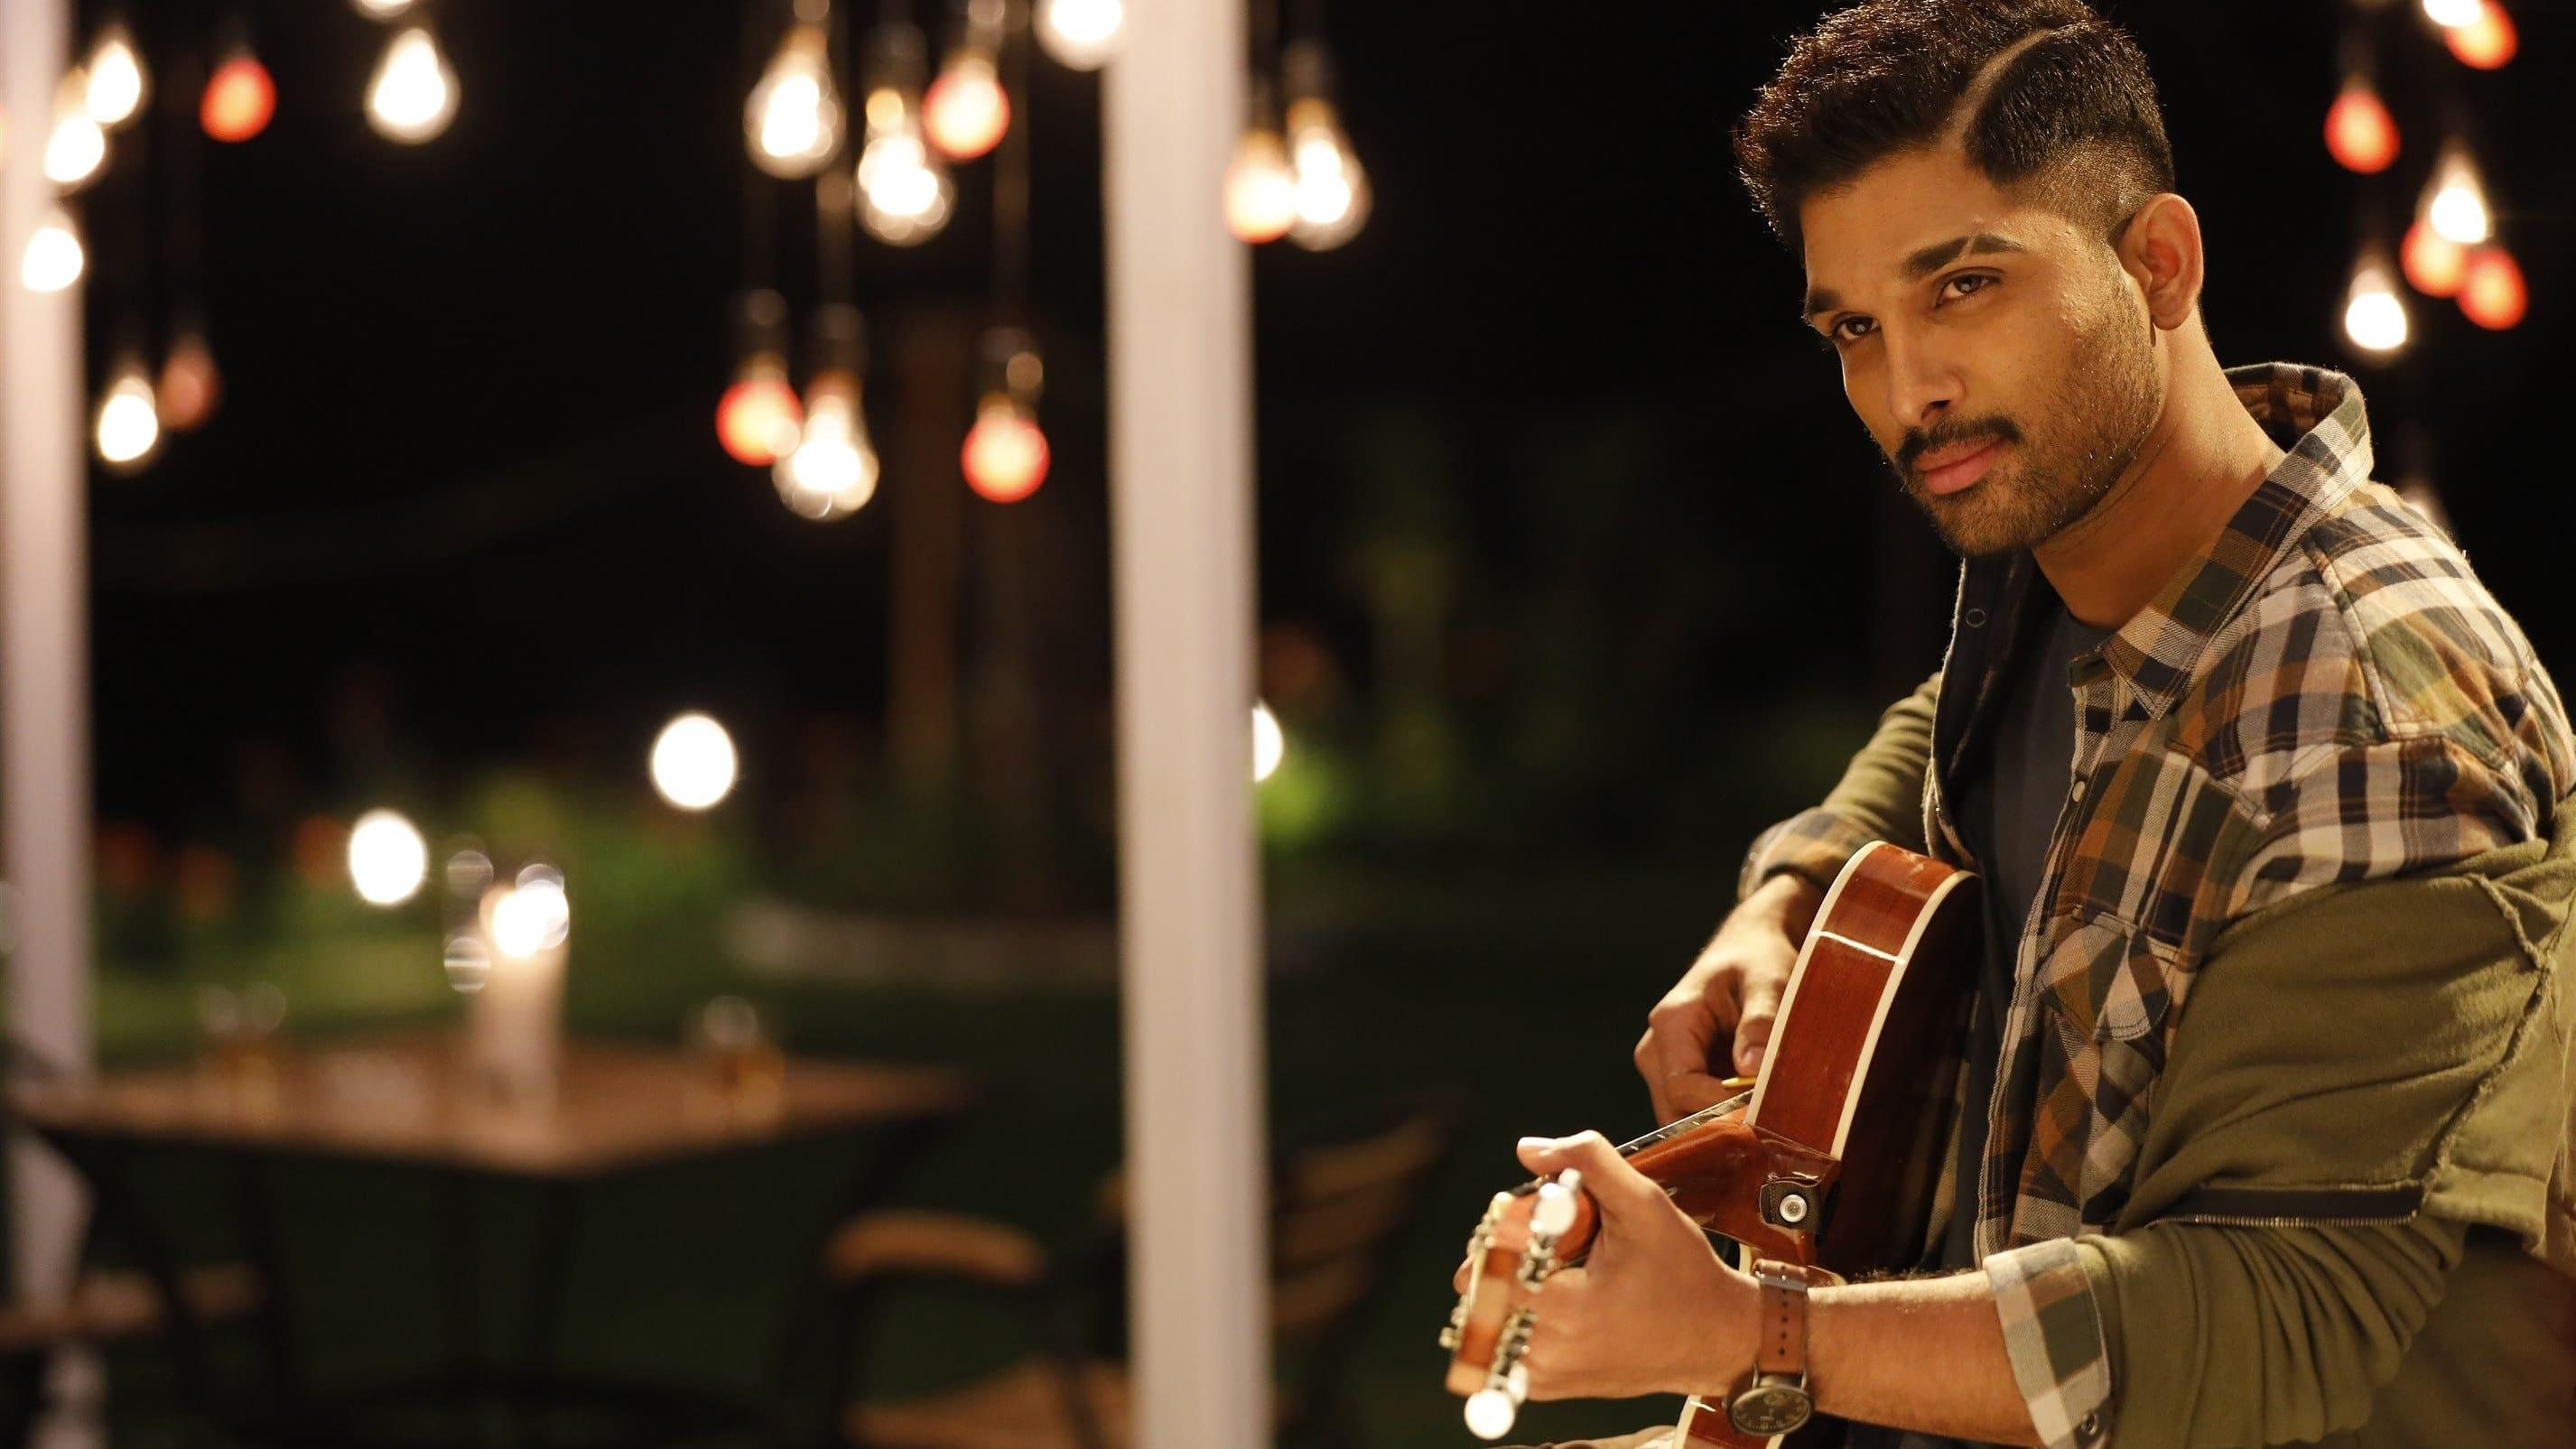 naa peru surya full south movie download in hindi full hd 2018